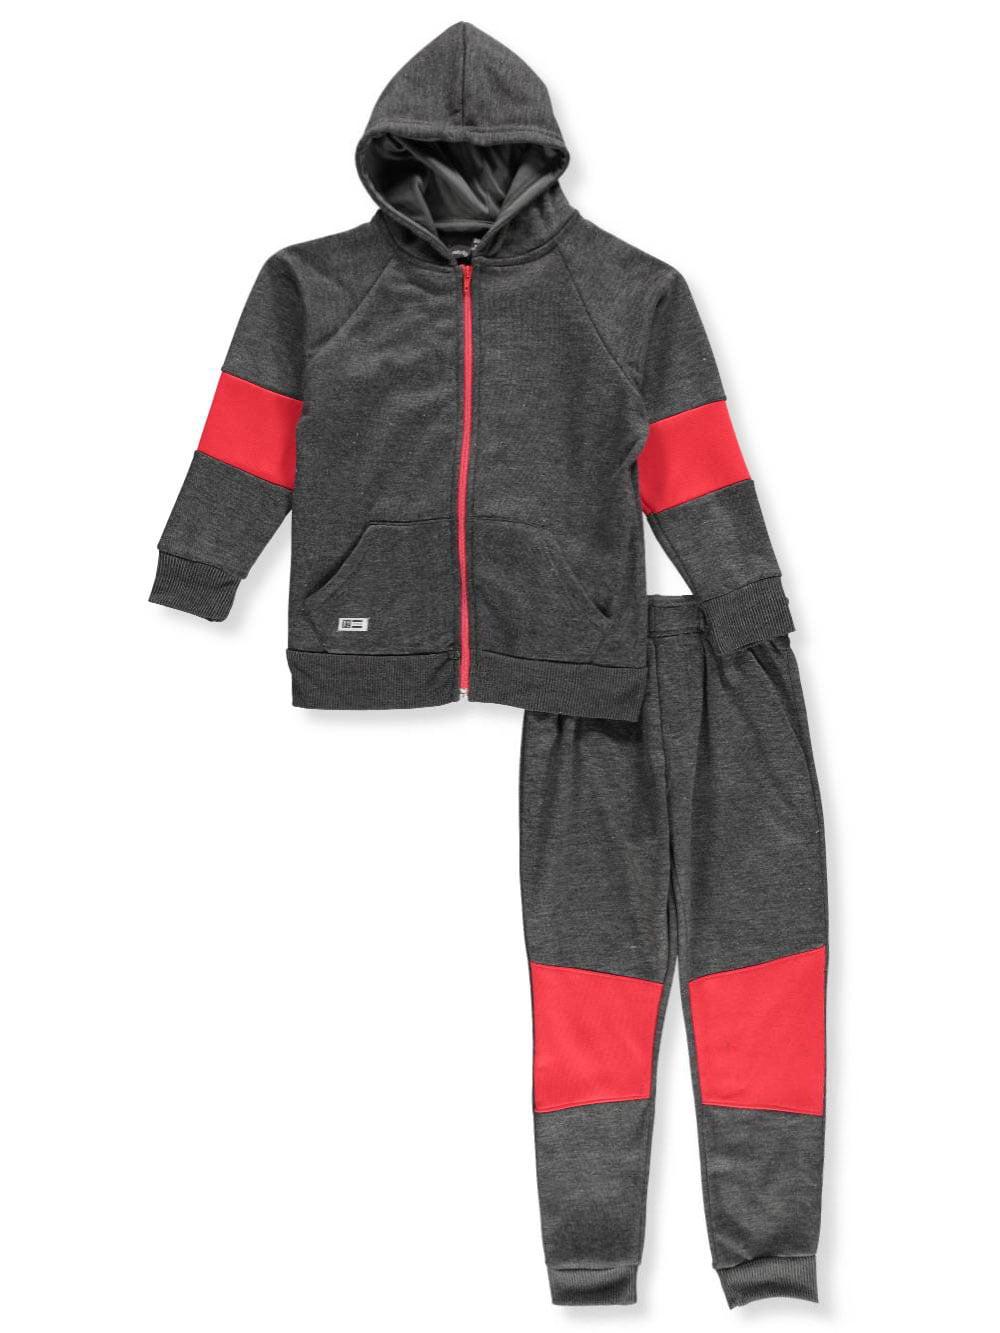 Beverly Hills Polo Club Boys' 2-Piece Sweatsuit Pants Set